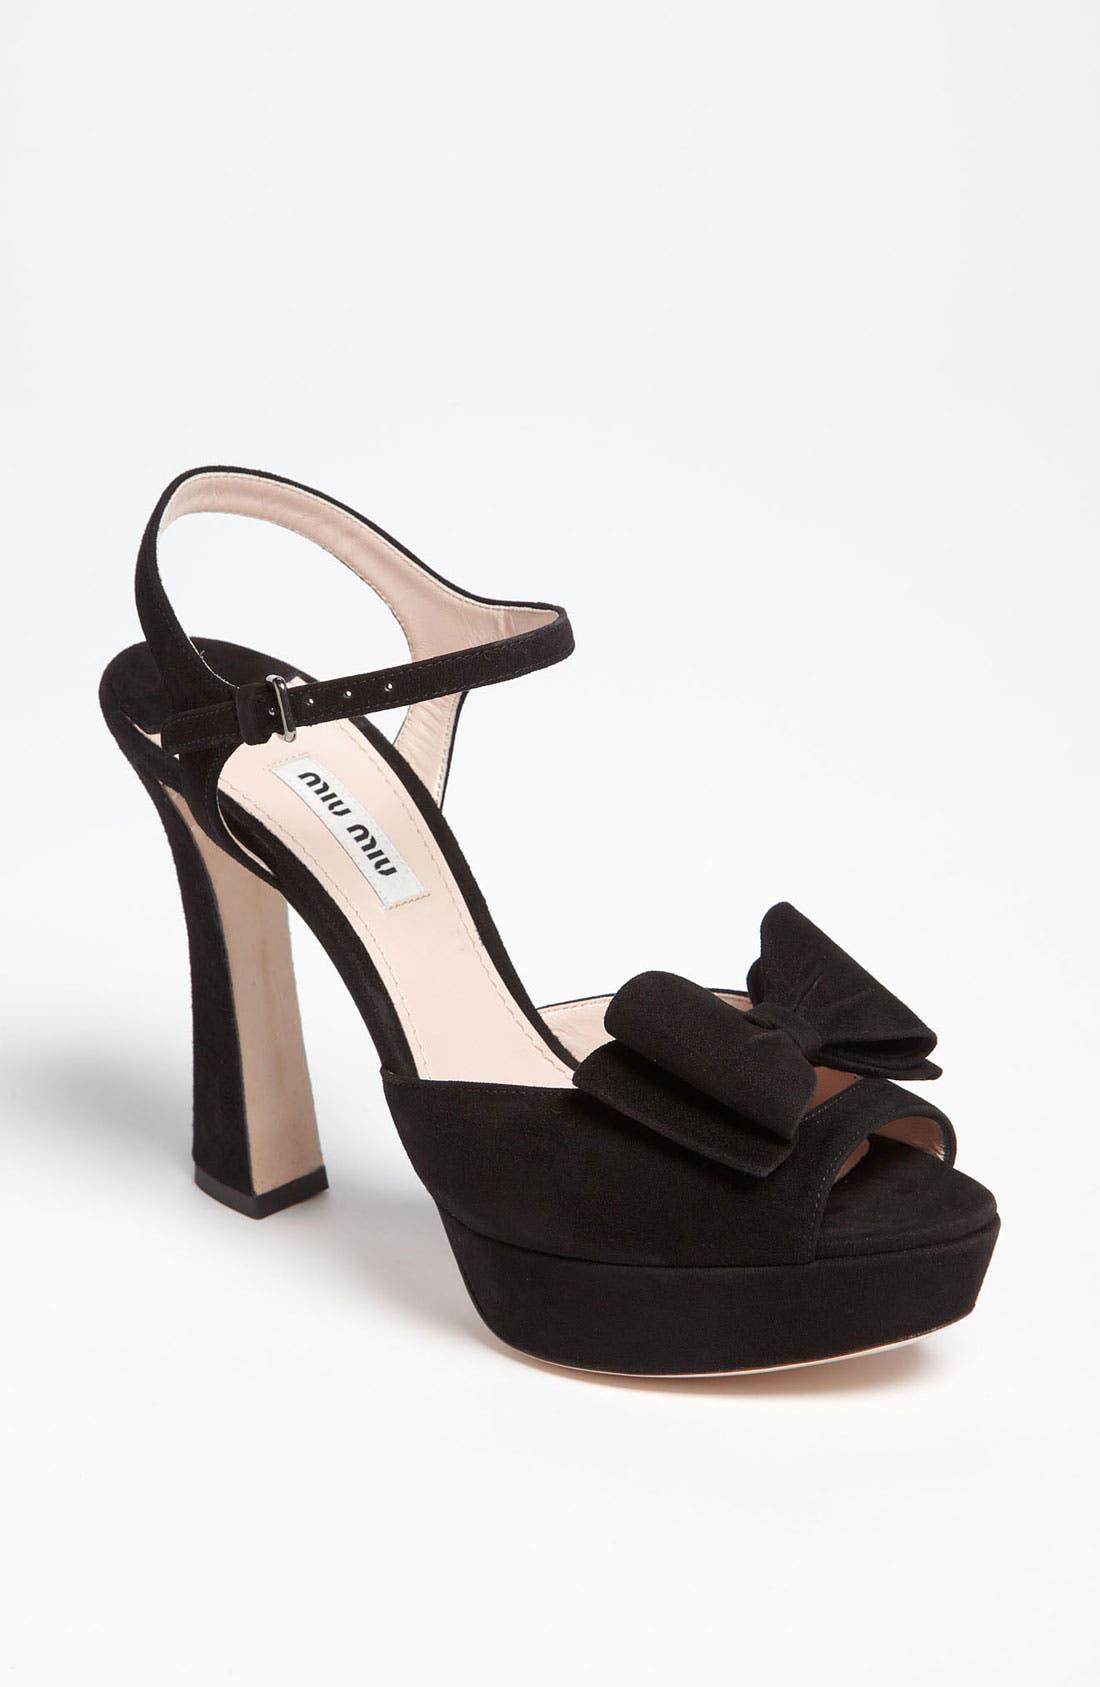 Main Image - Miu Miu Quarter Strap Sandal